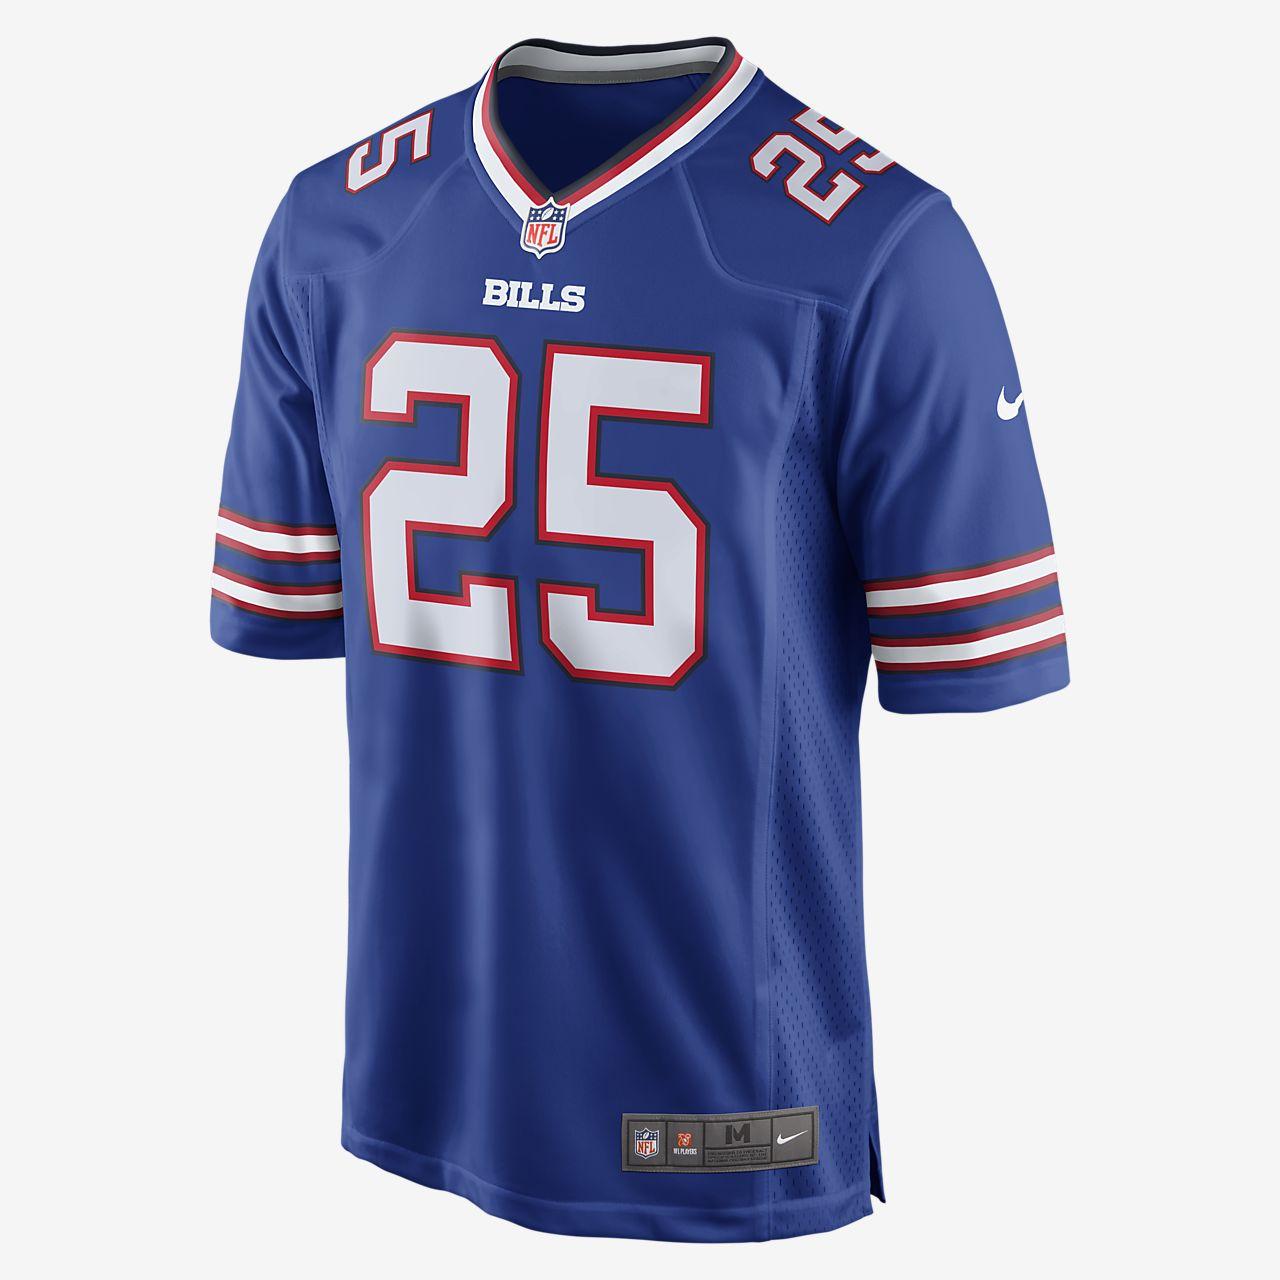 NFL Buffalo Bills (LeSean McCoy) American Football Herren-Spieltrikot